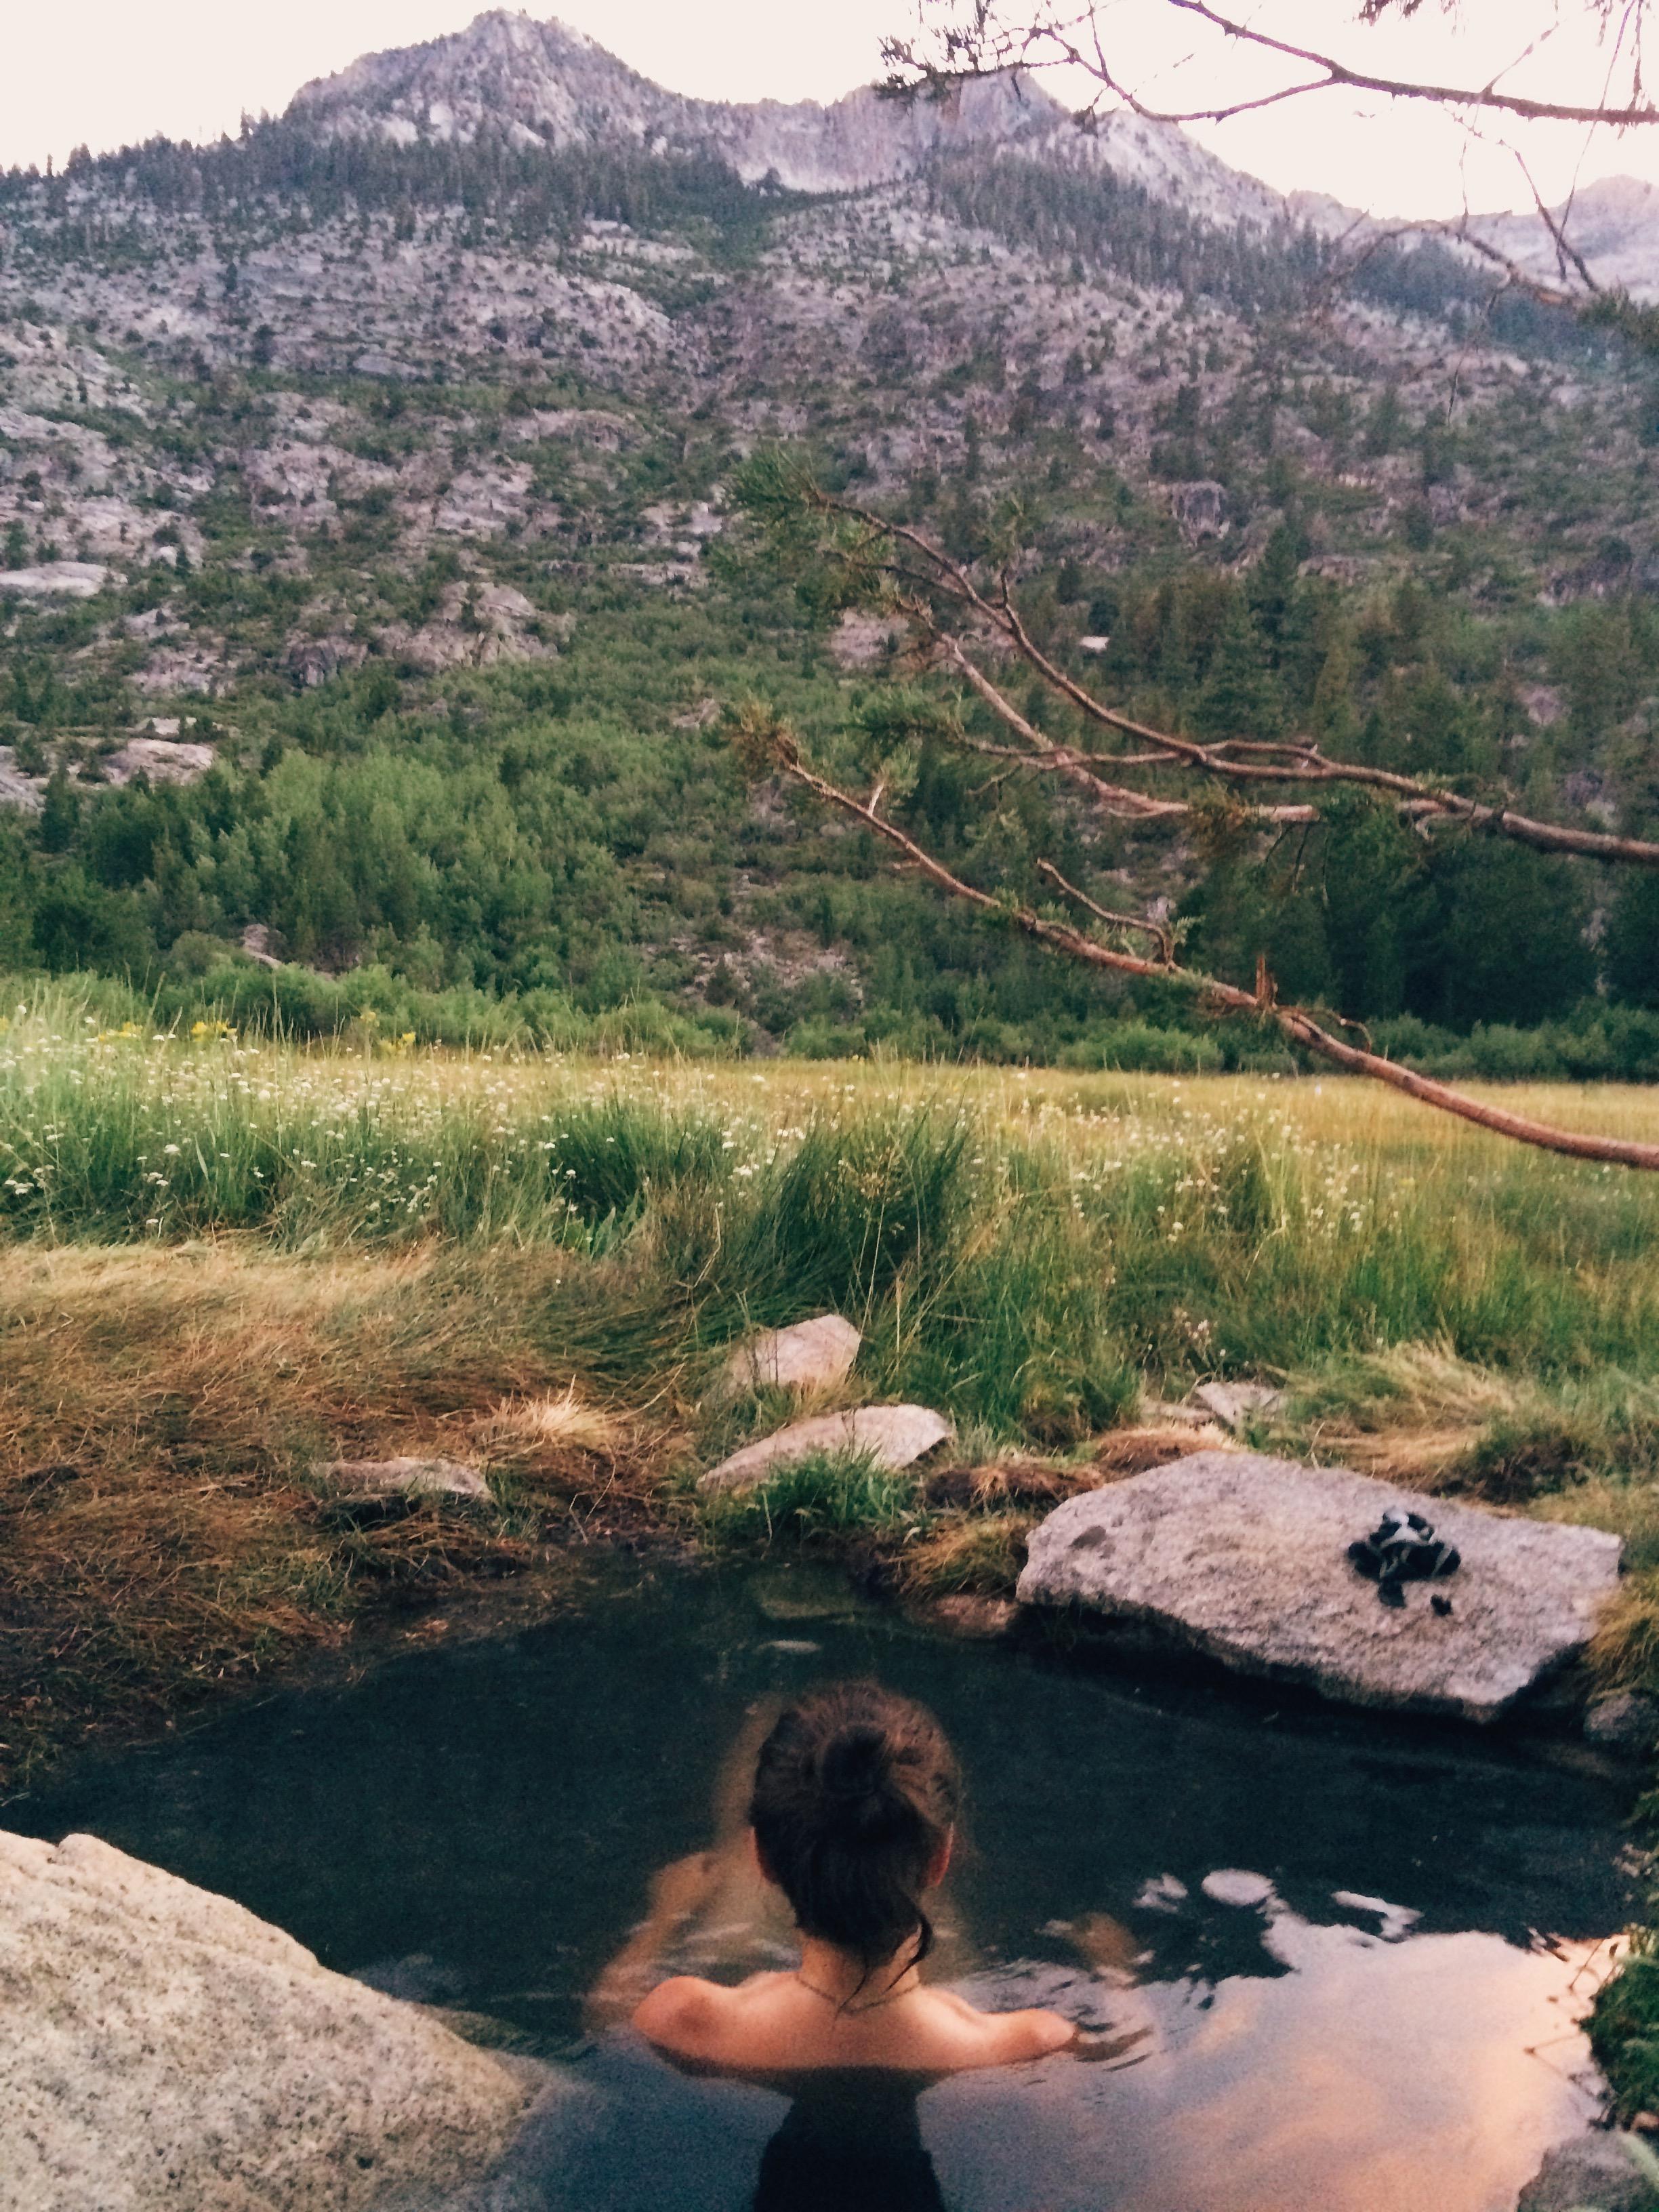 Blayney Hot Springs, across the San Joaquin River.